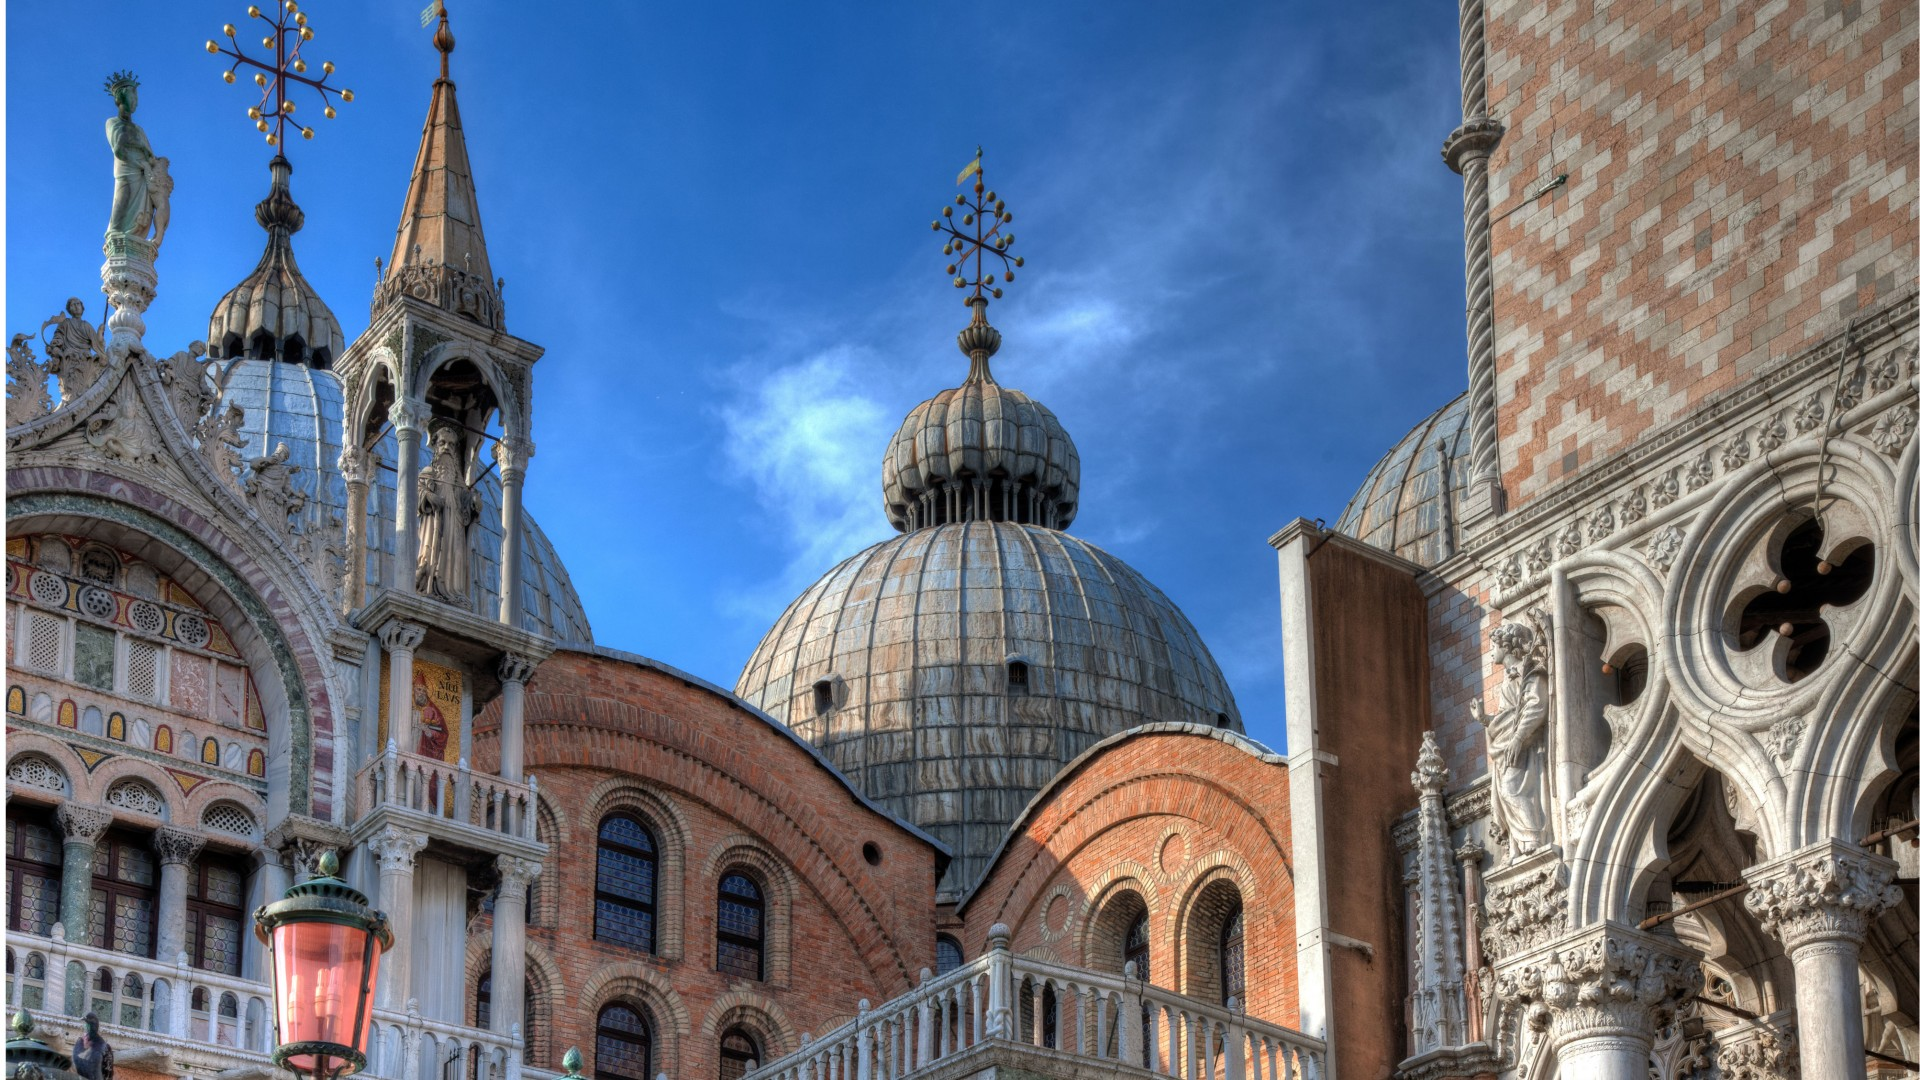 Basilica di San Marco, Italy